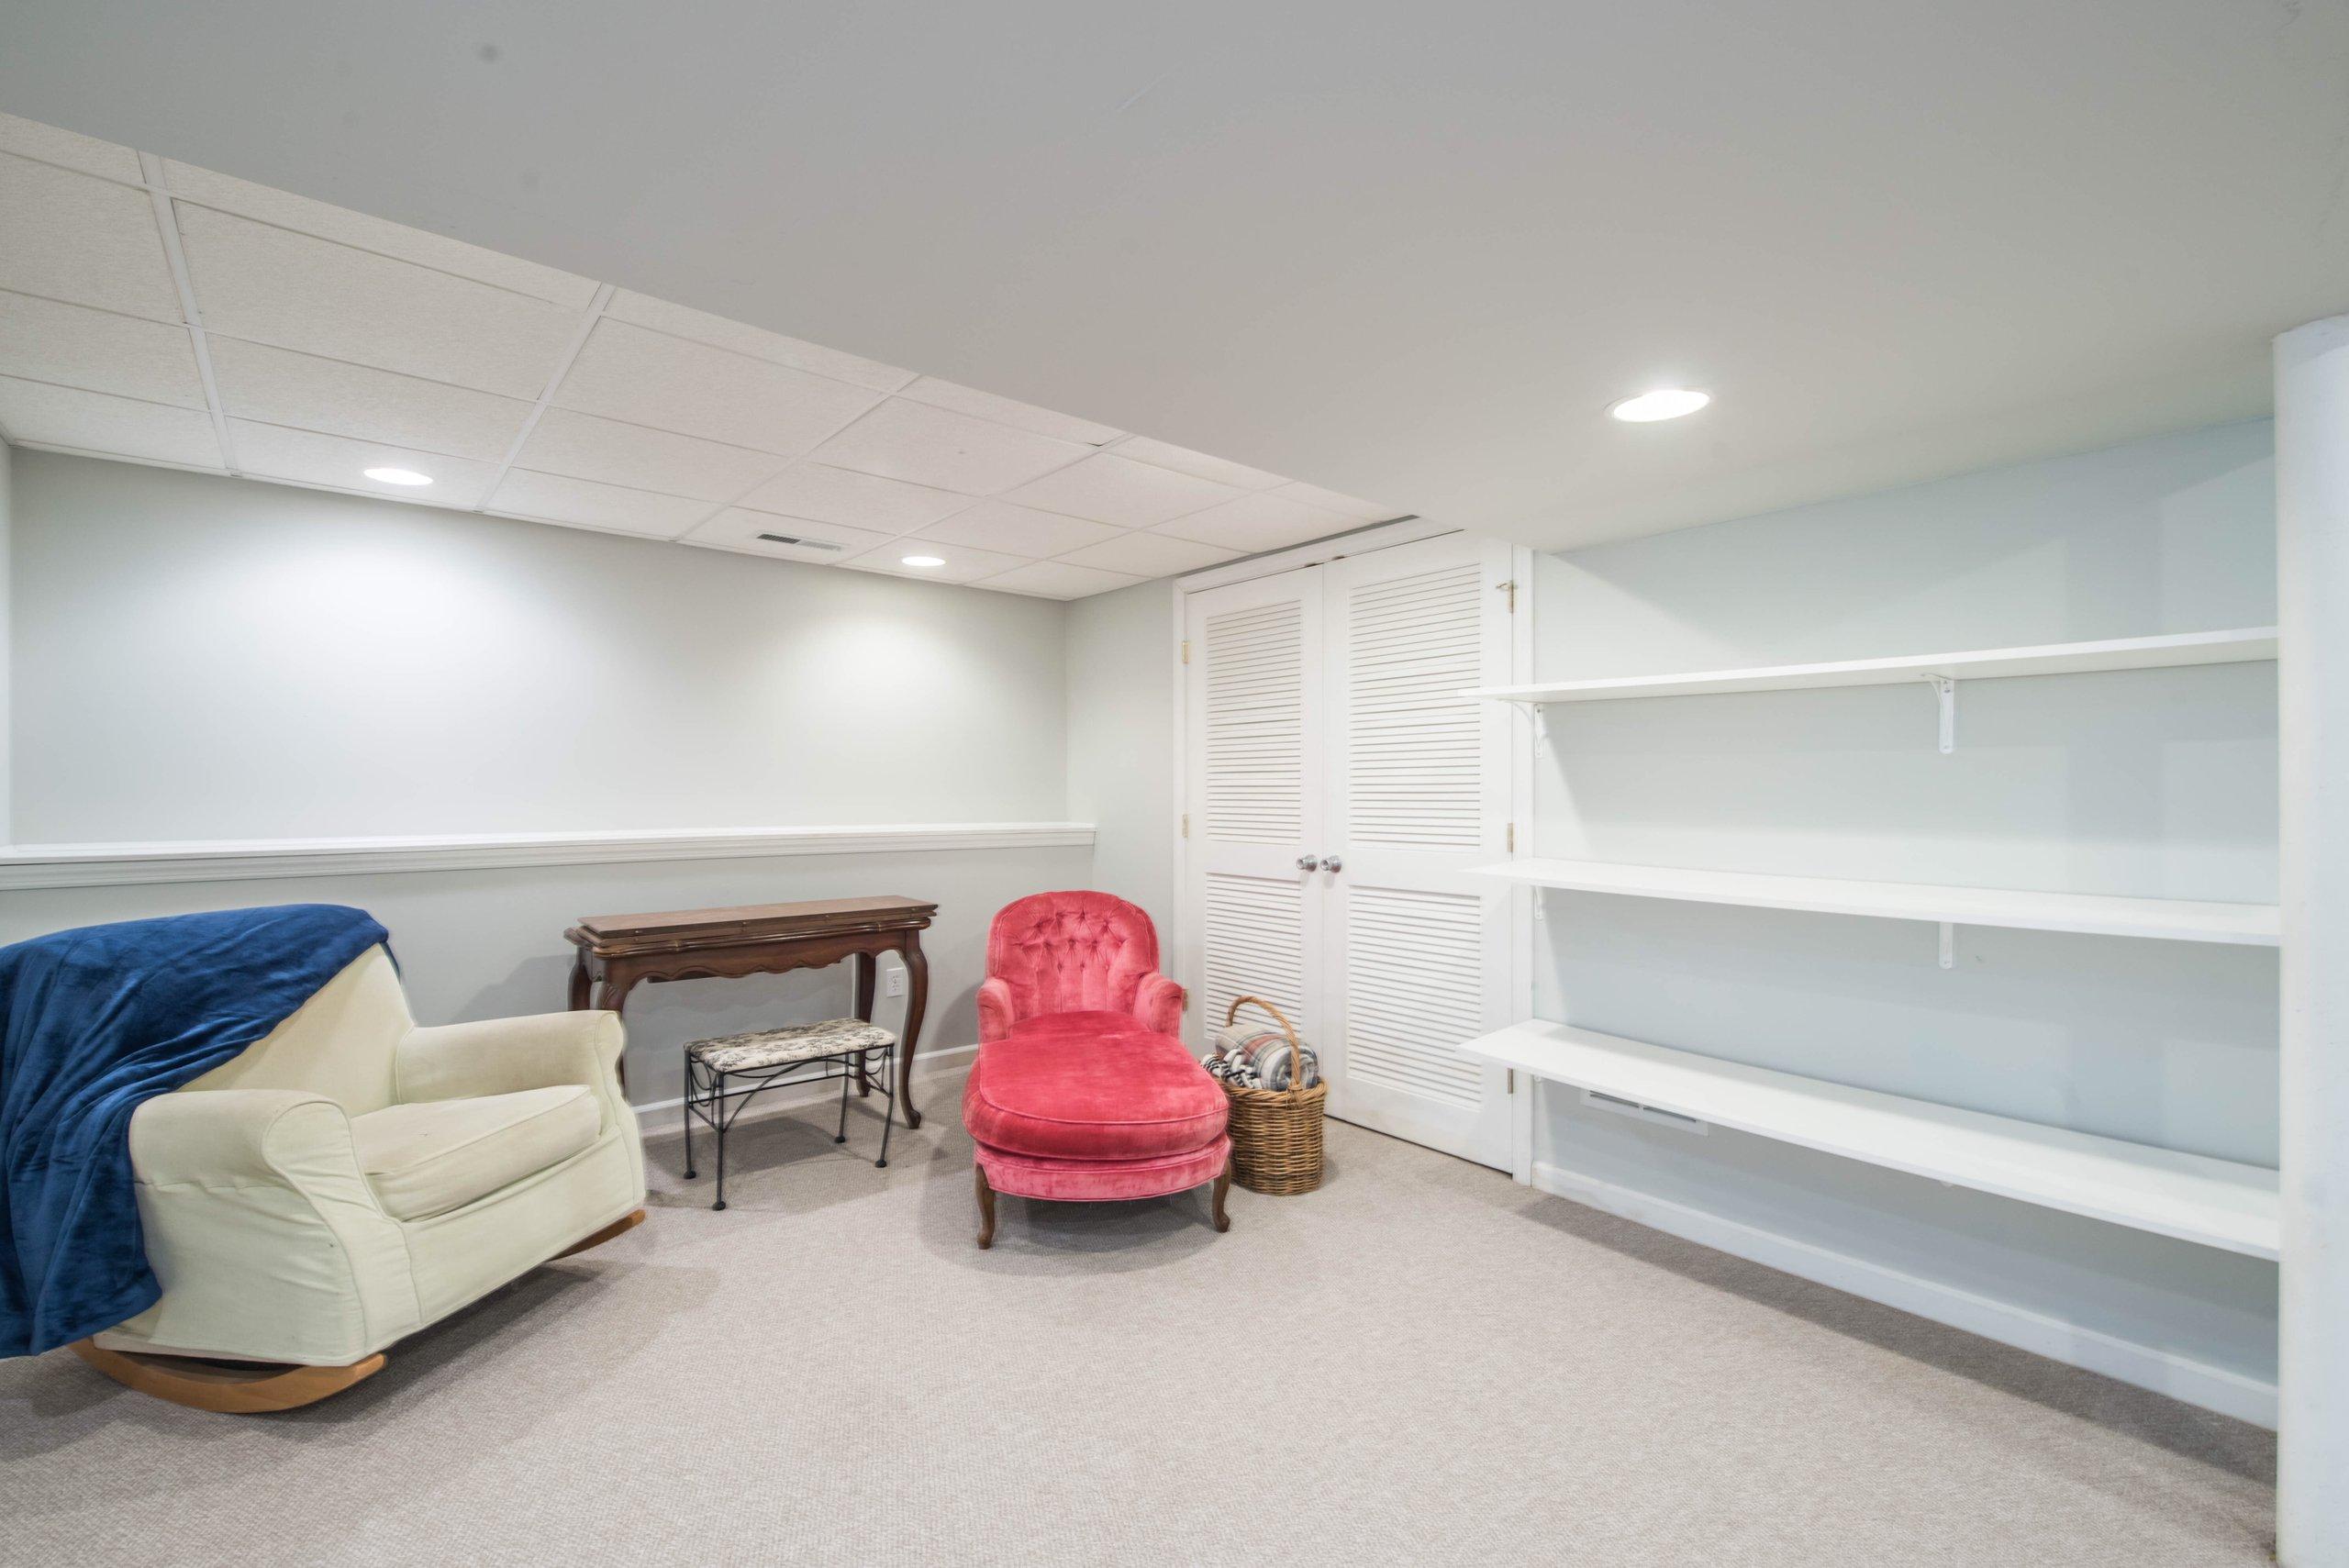 31x33 Shed self storage unit